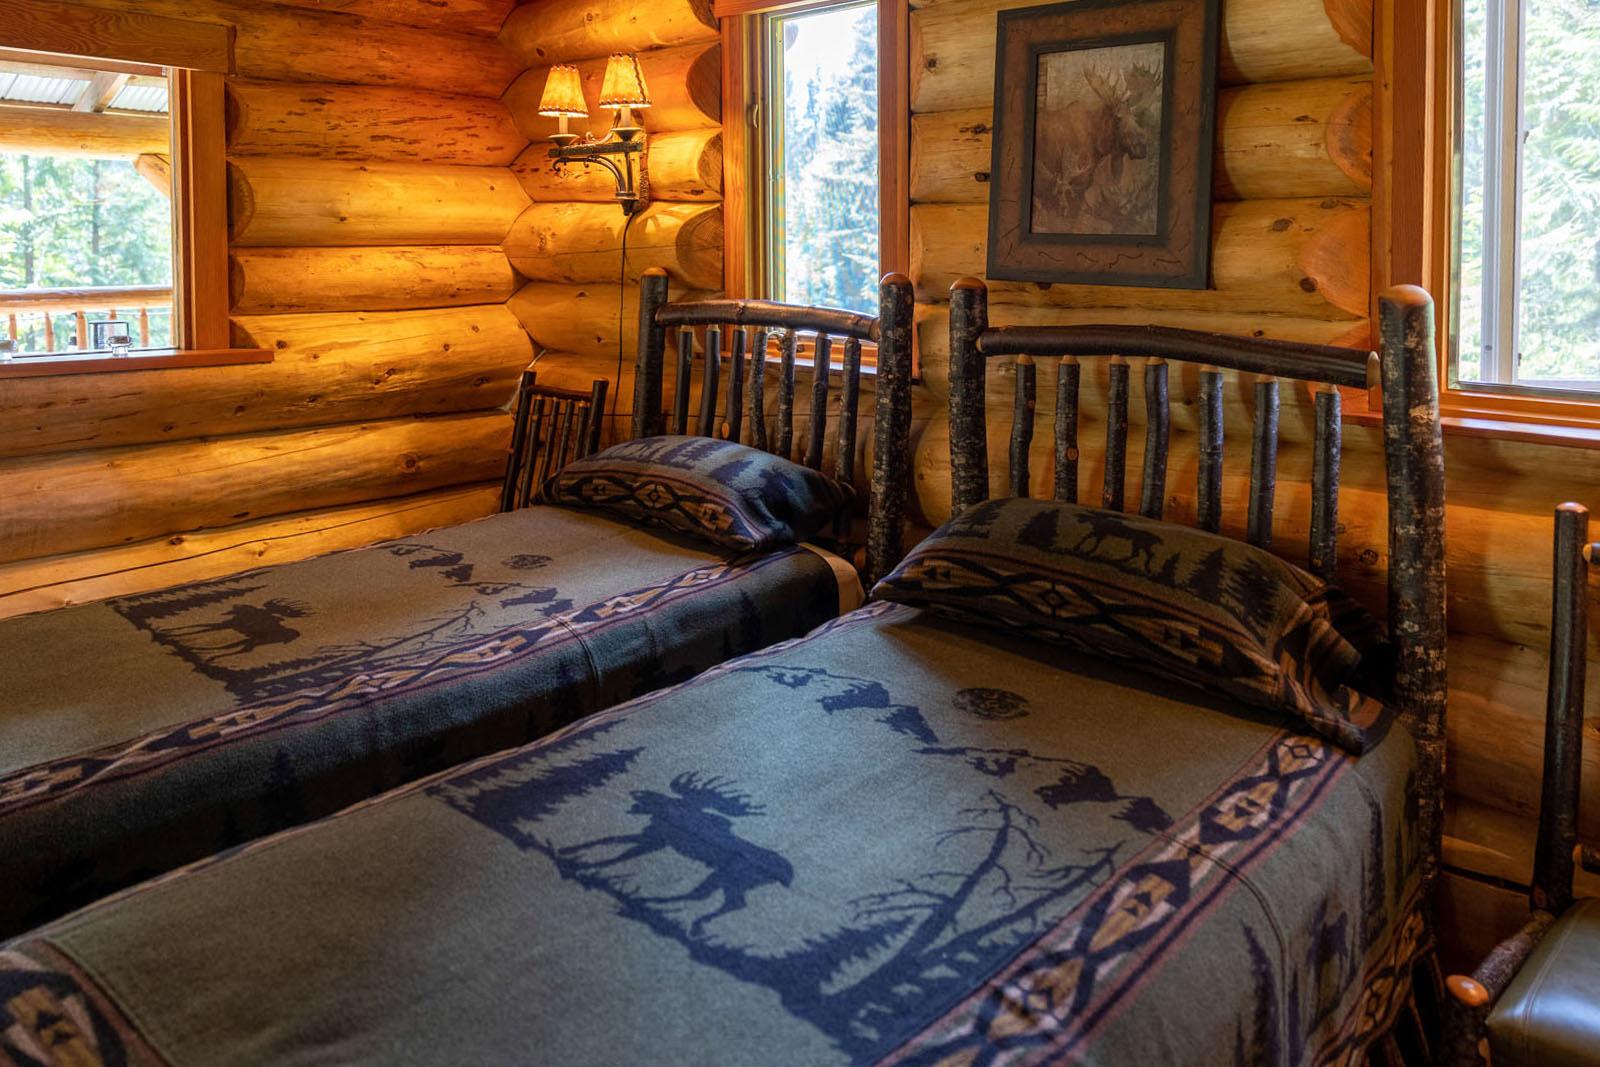 Mount robson log home 29